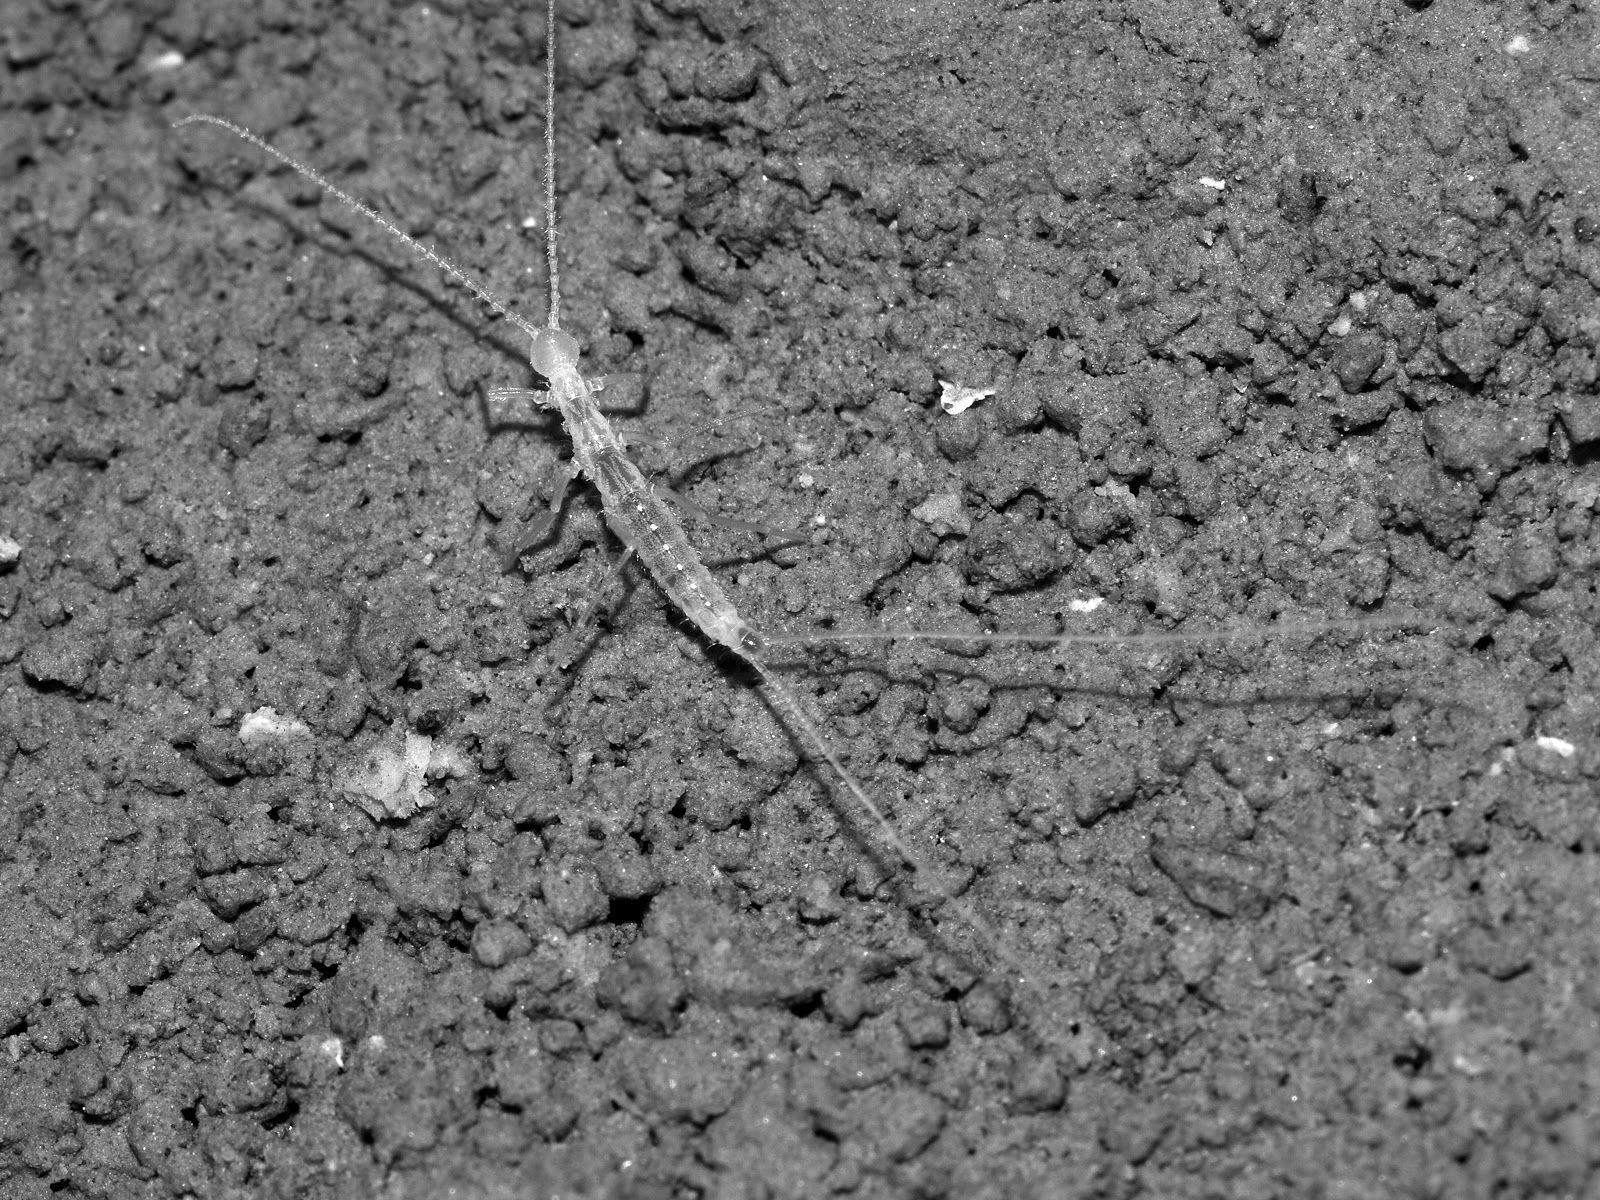 Turkmenocampa mirabilis